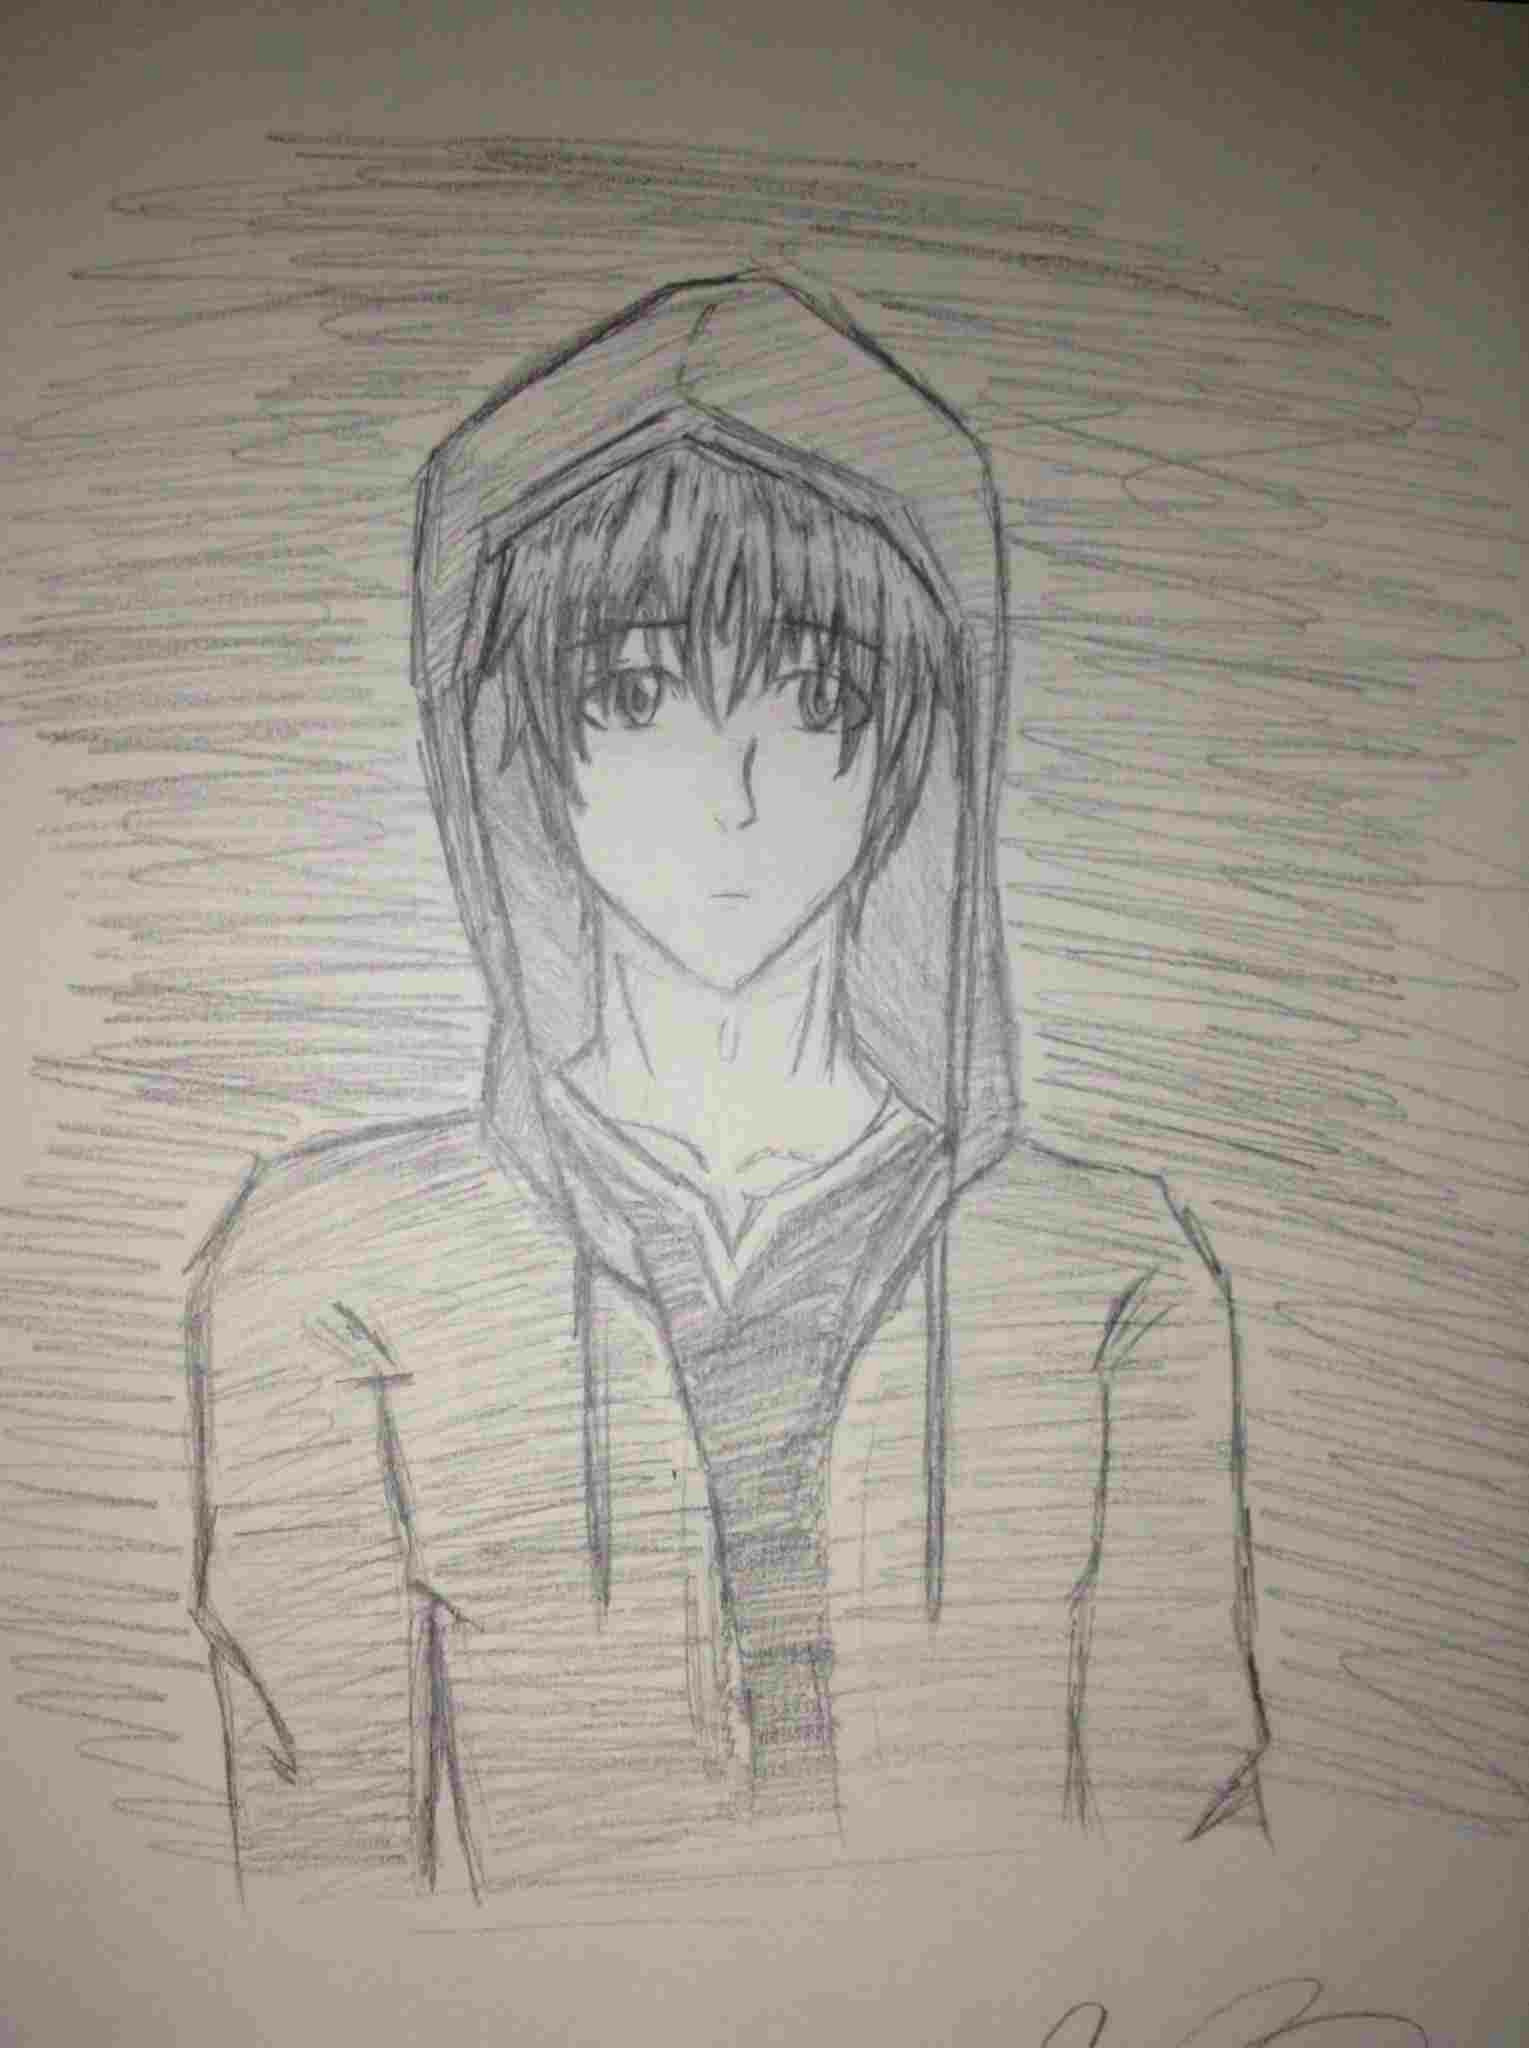 od zuzia na s w pinterest art i artworkrhpinterestcom pin hoodie girl drawing realistic od zuzia na s w pinterest art i artworkrhpinterestcom hooded manga boy jpg